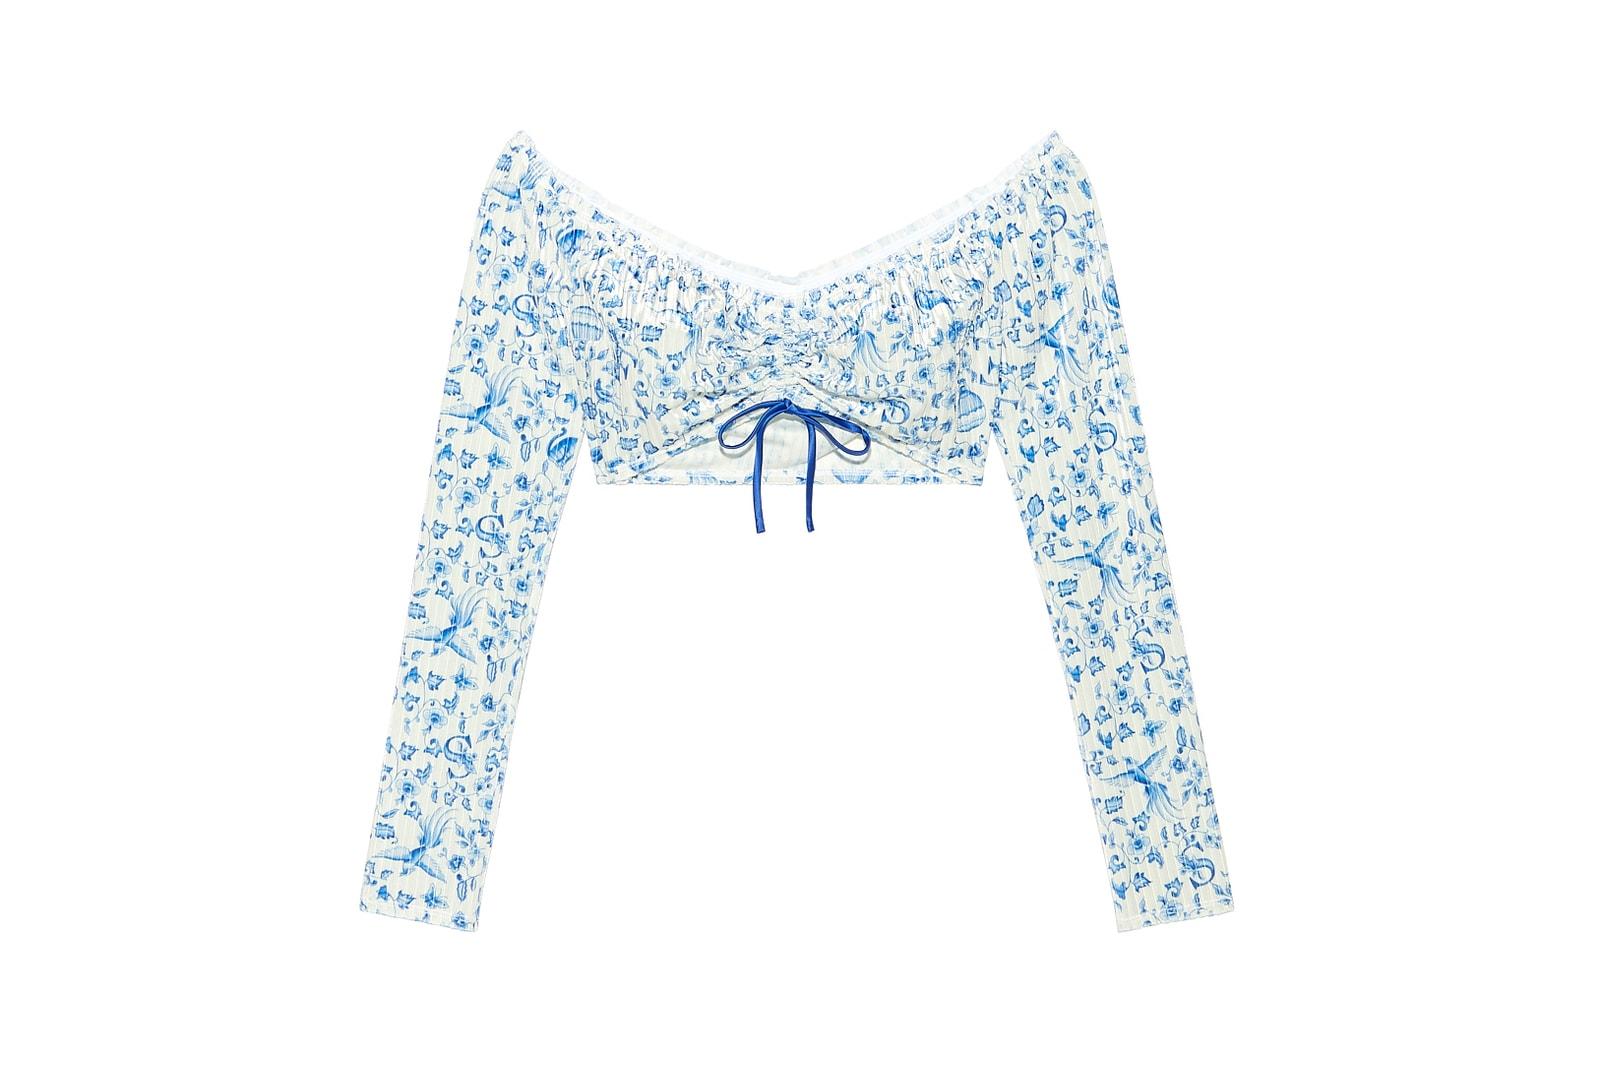 Rihanna Savage X Fenty December Lingerie Collection Campaign Bra Underwear